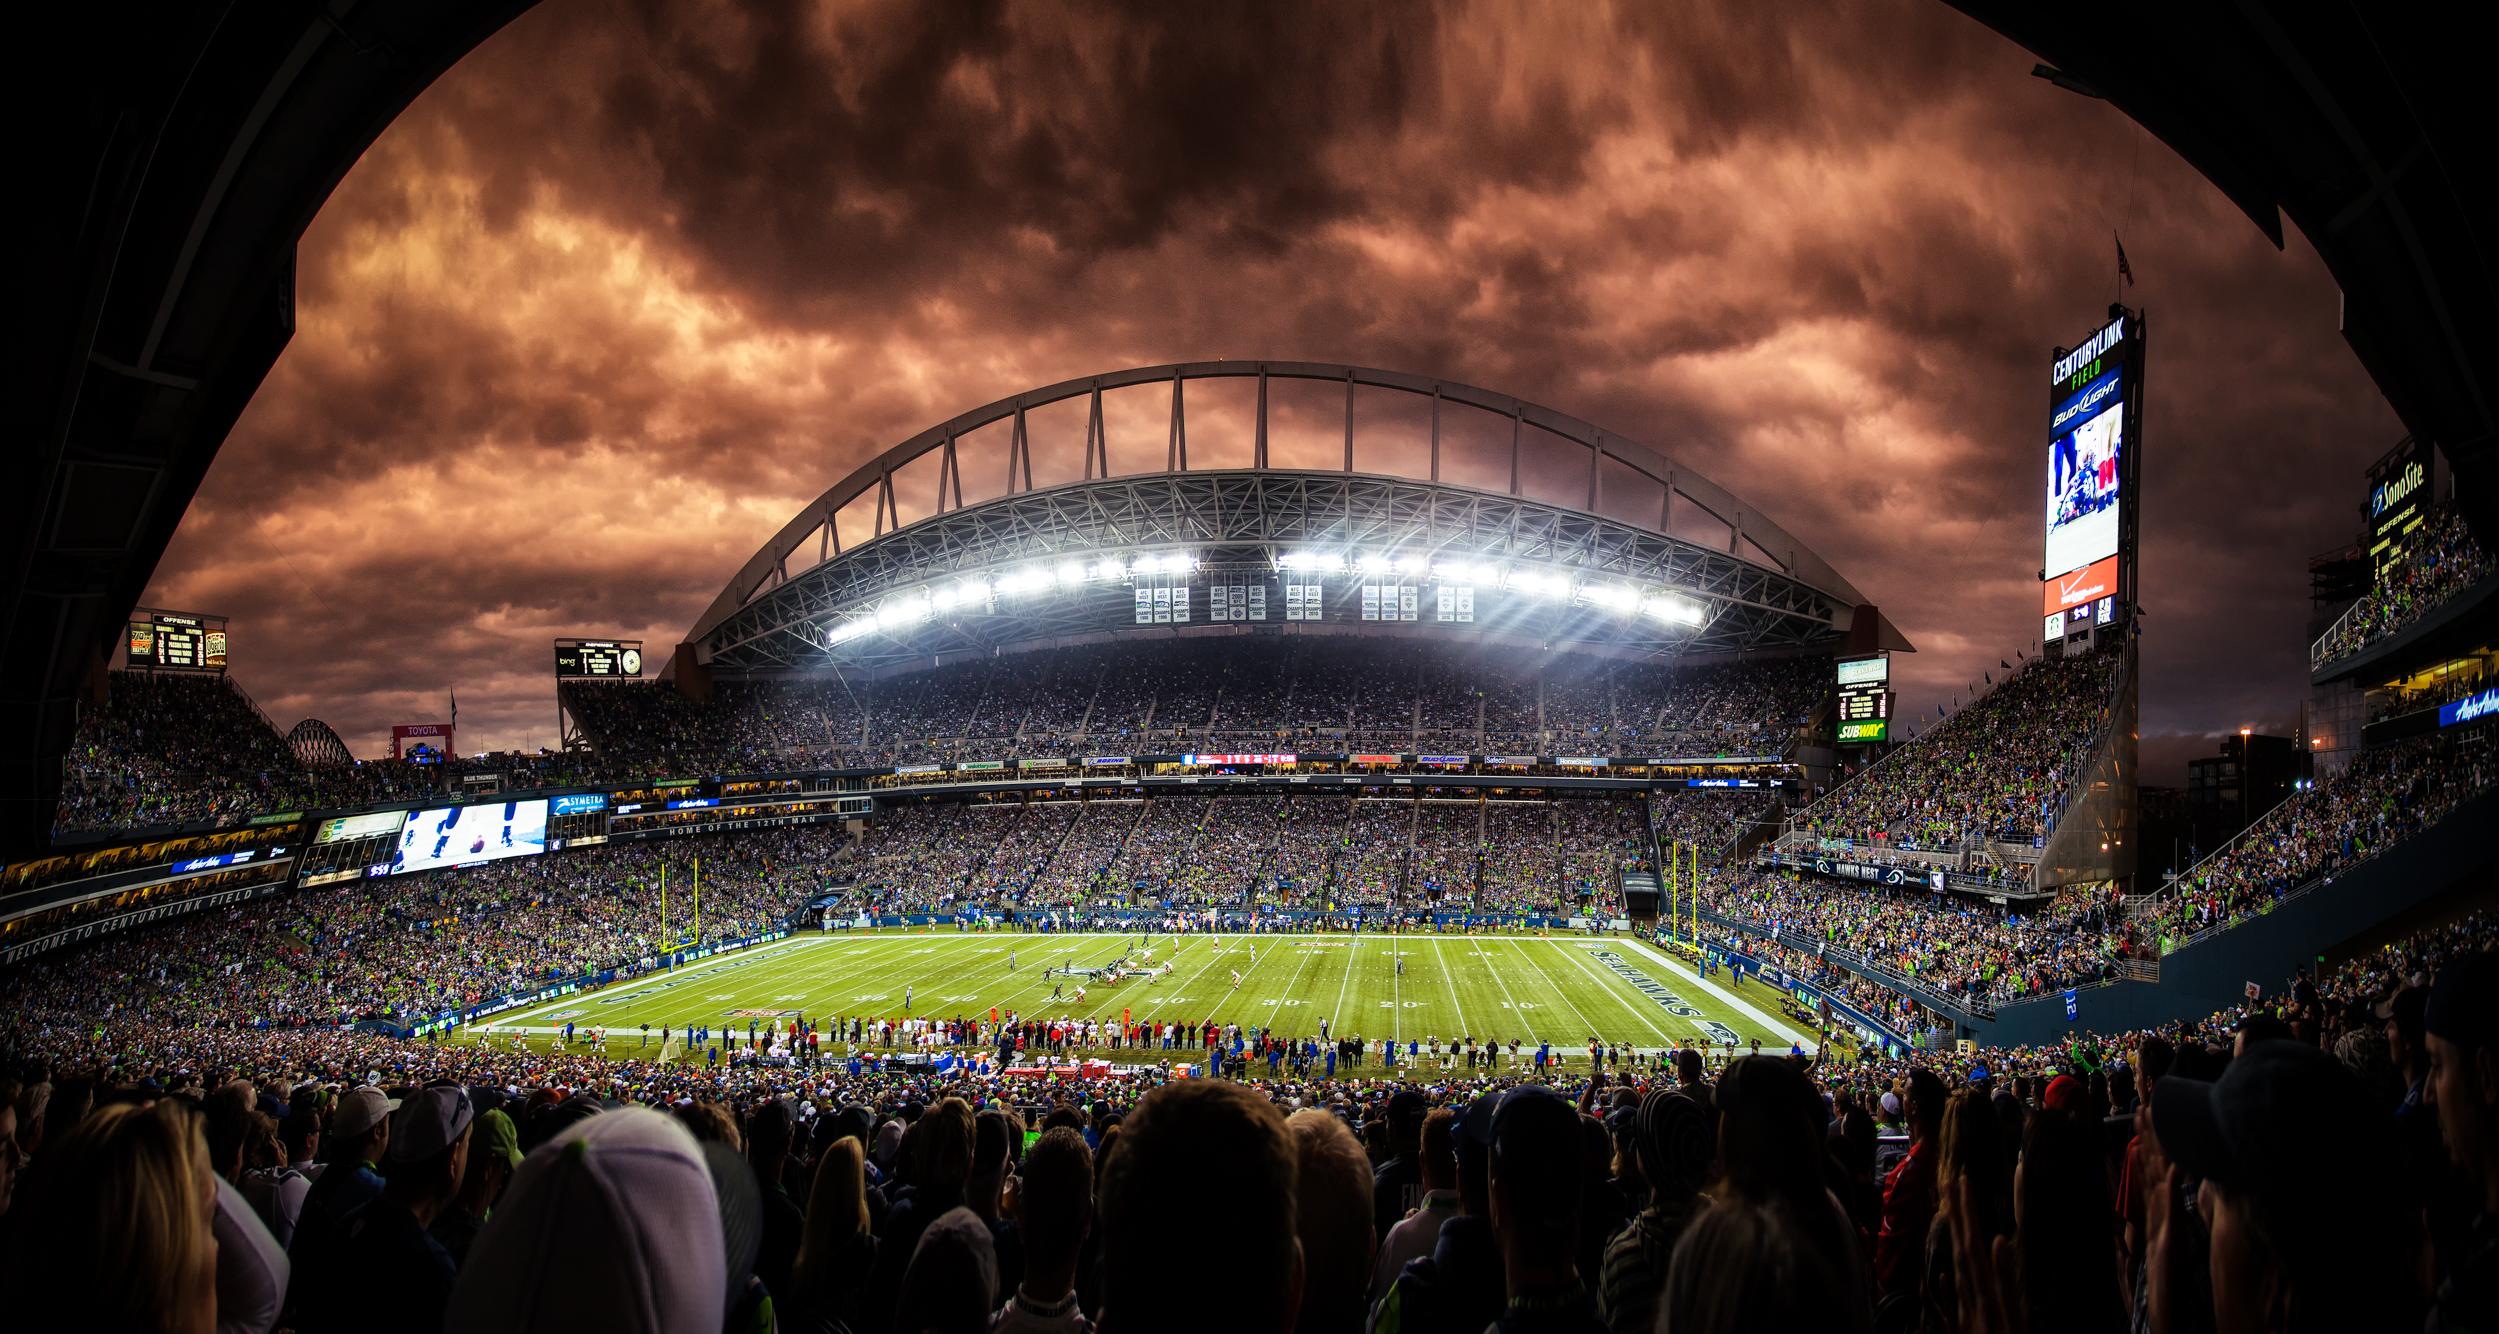 2013 Seattle Seahawks nfl football Qwest stadium g wallpaper 2499x1334